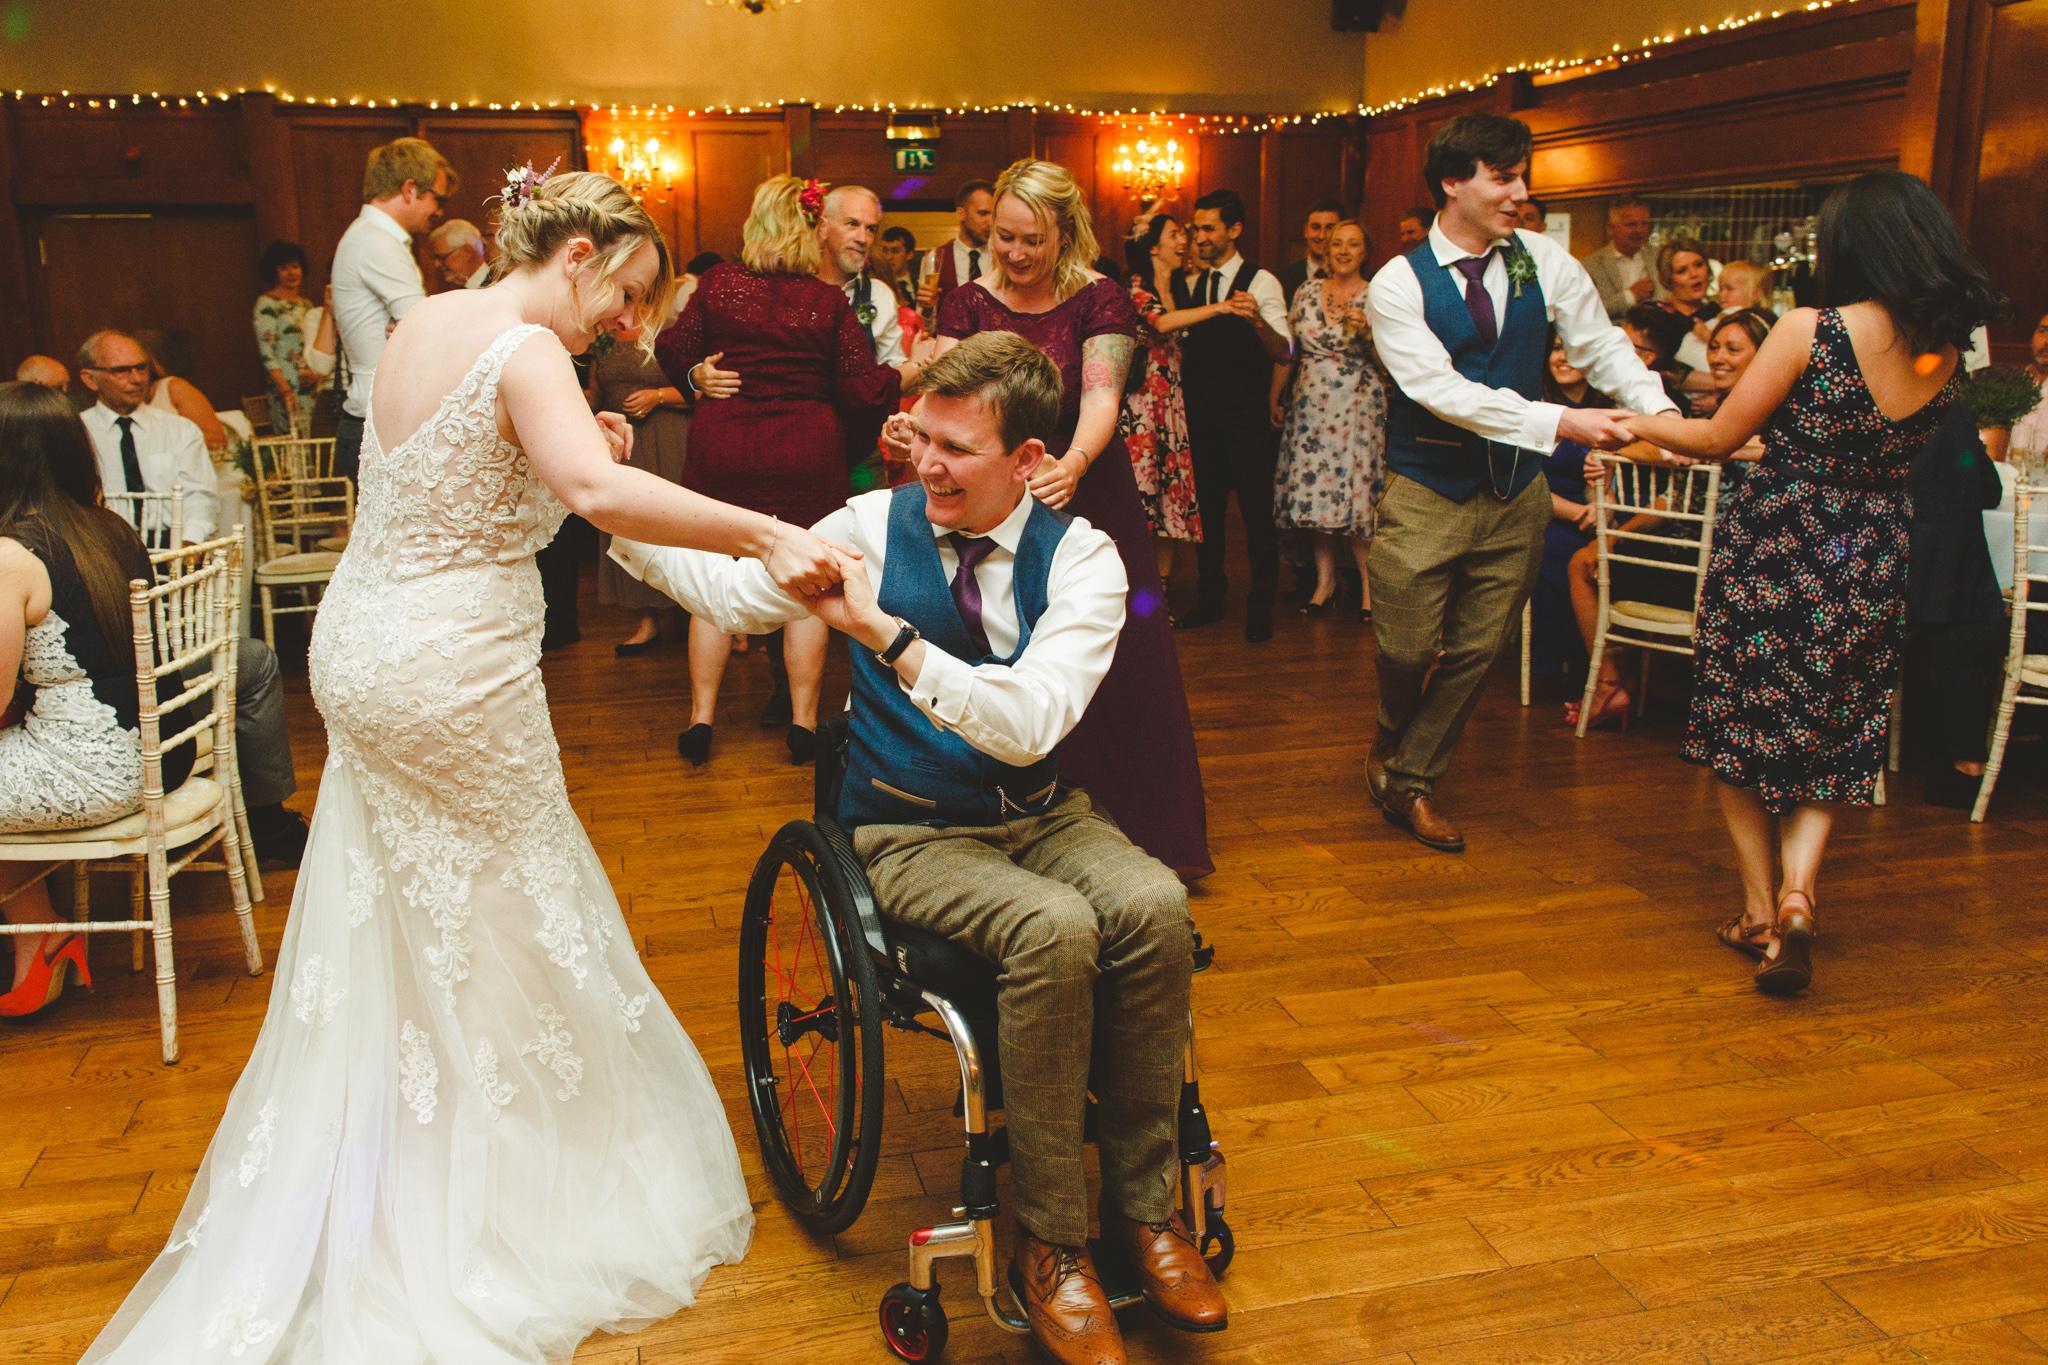 derbyshire-wedding-photographer-videographer-camera-hannah-23.jpg